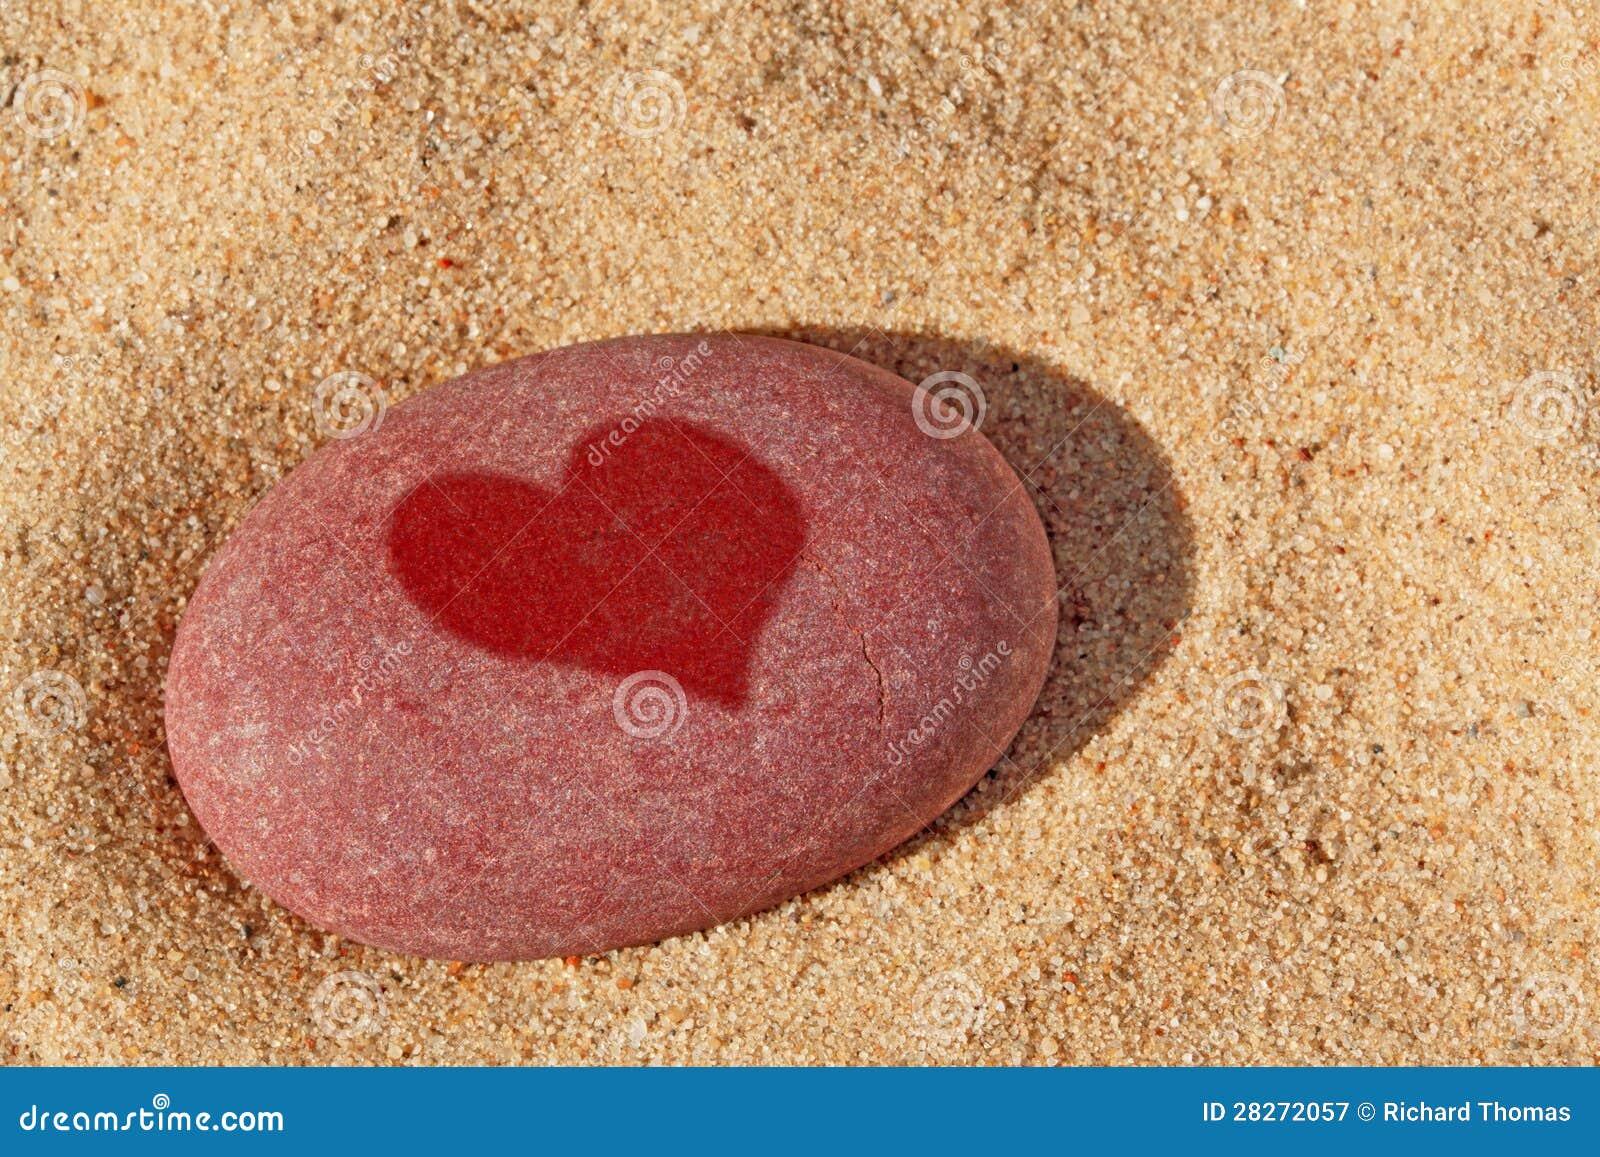 Pebble dating